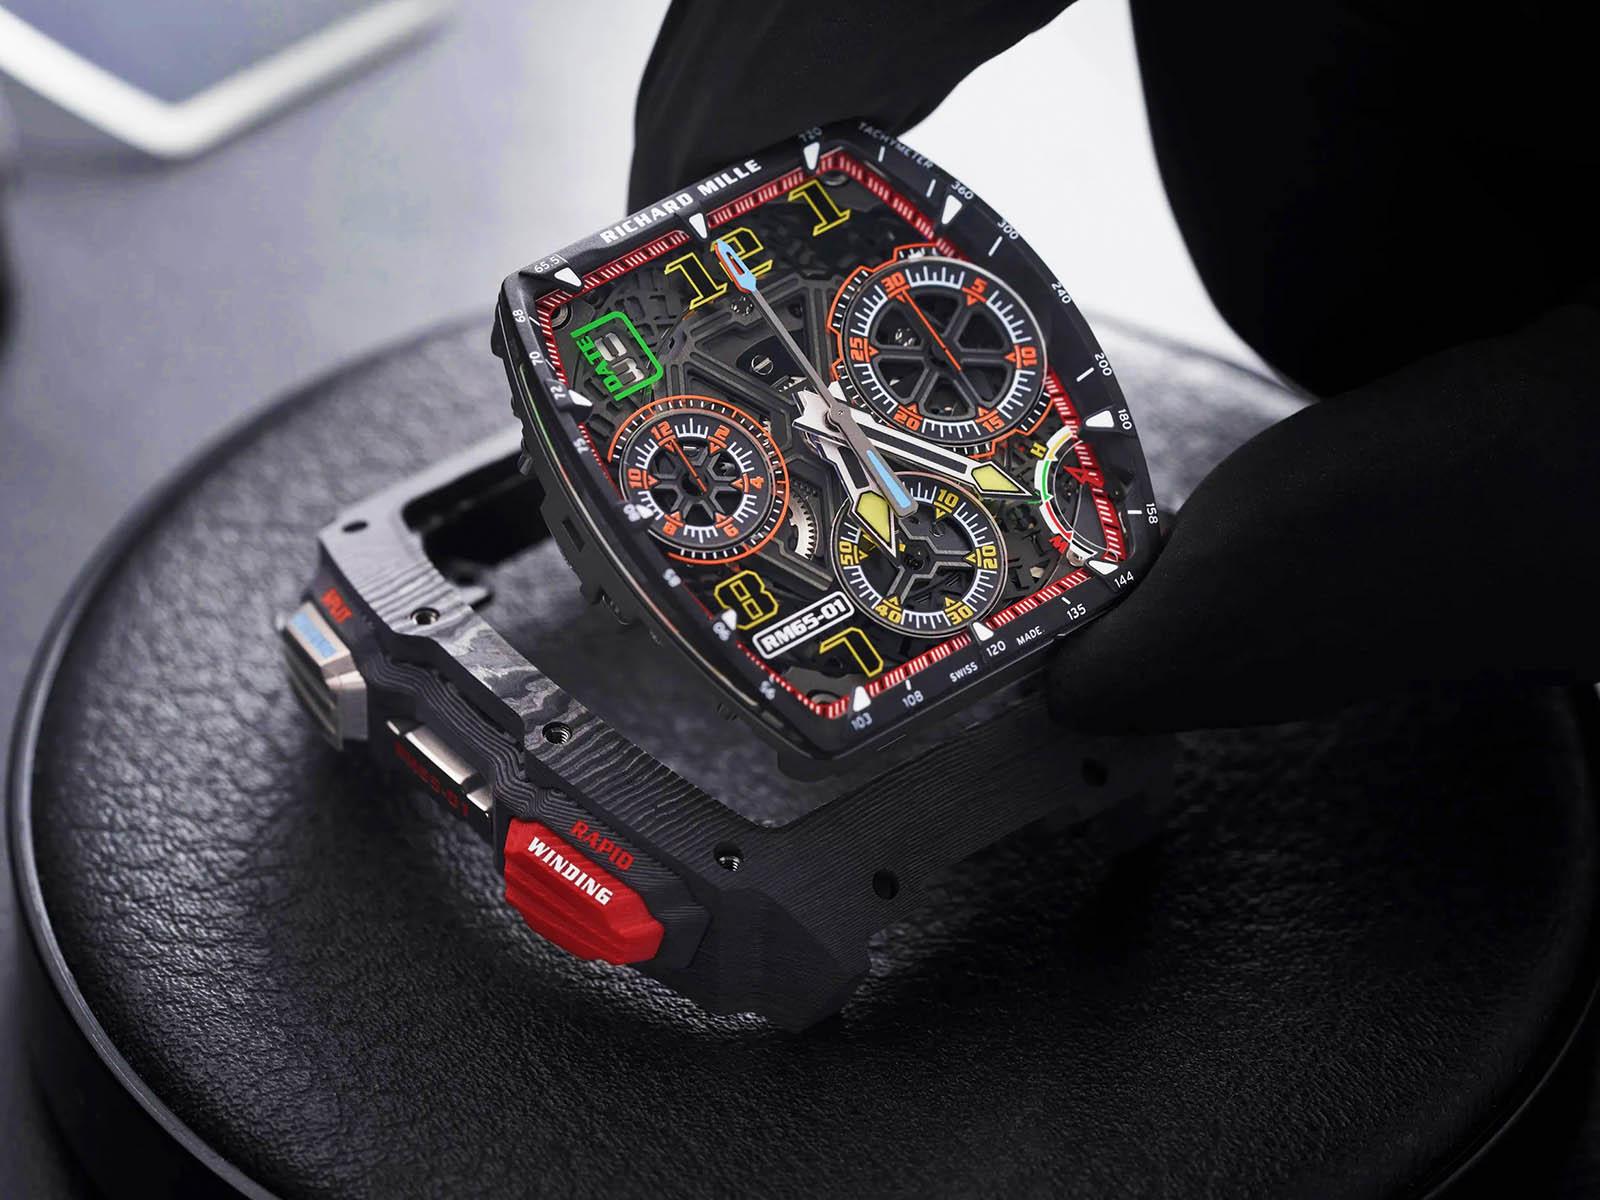 richard-mille-rm-65-01-automatic-split-seconds-chronograph-5.jpg